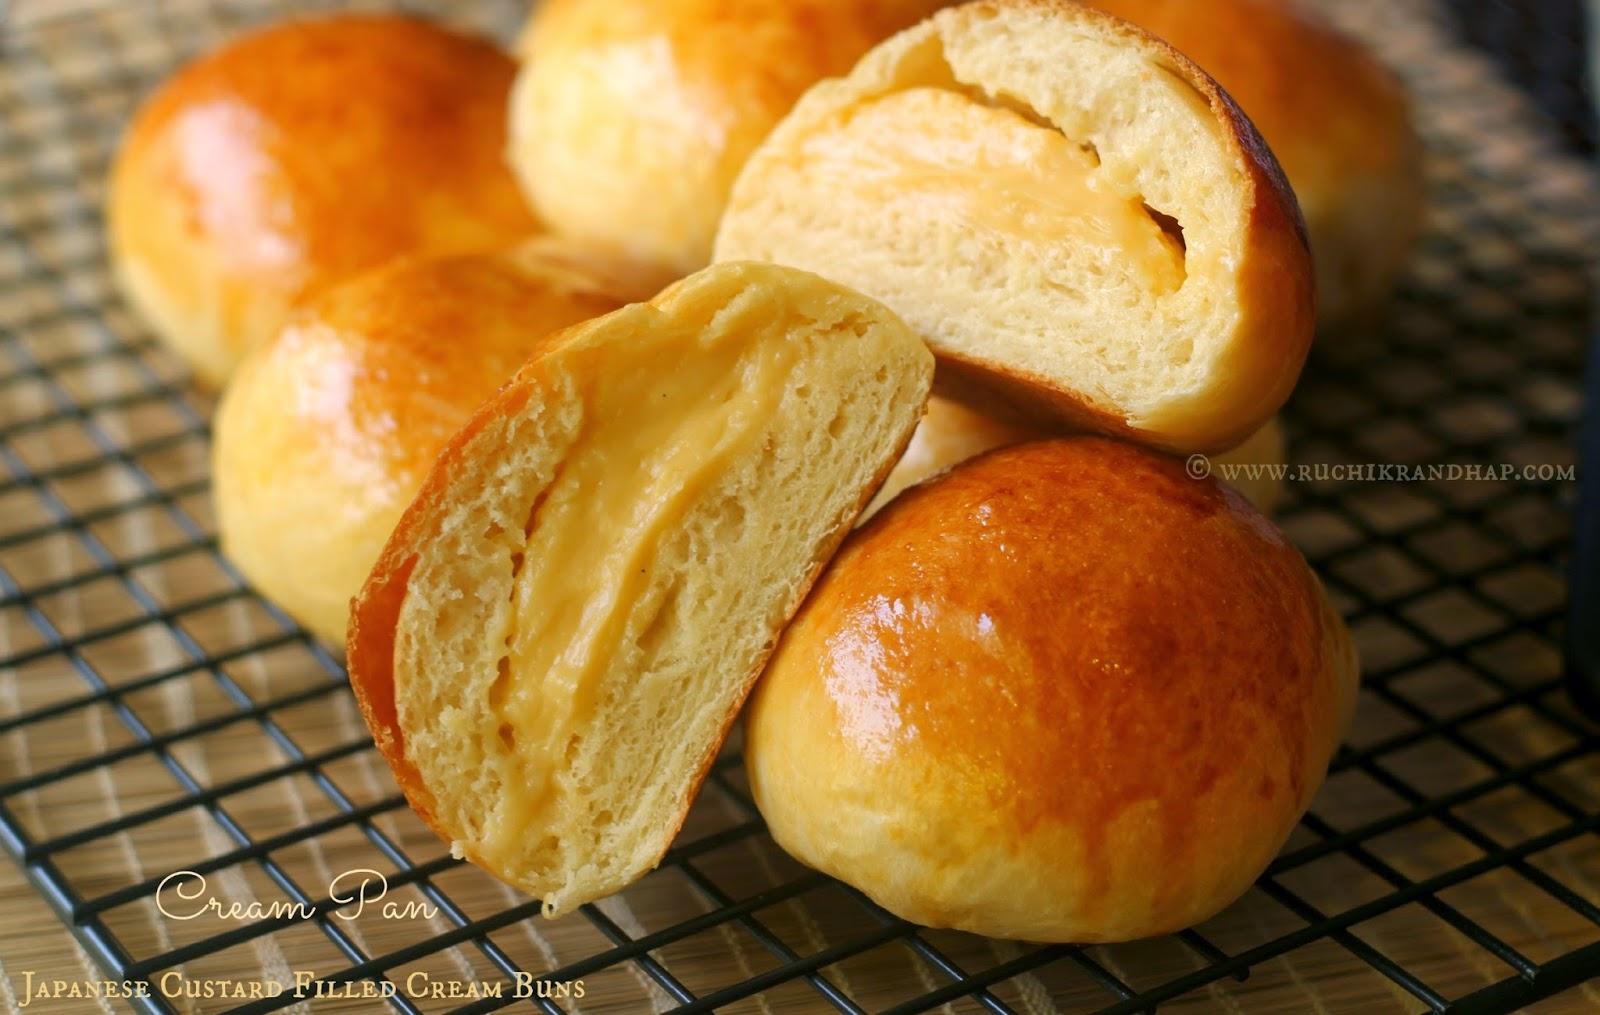 Cream Pan ~ Japanese Custard Filled Cream Buns #Breadbakers